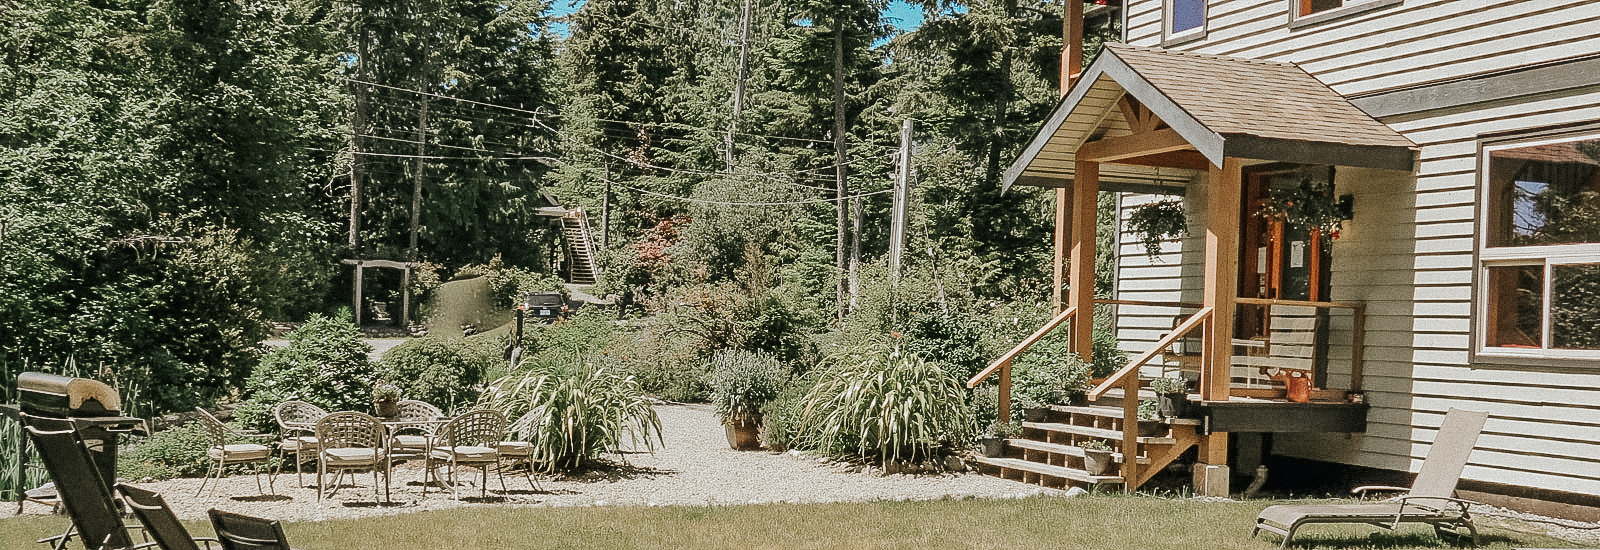 Cobble Wood & Bird Sanctuary Guesthouses Interior